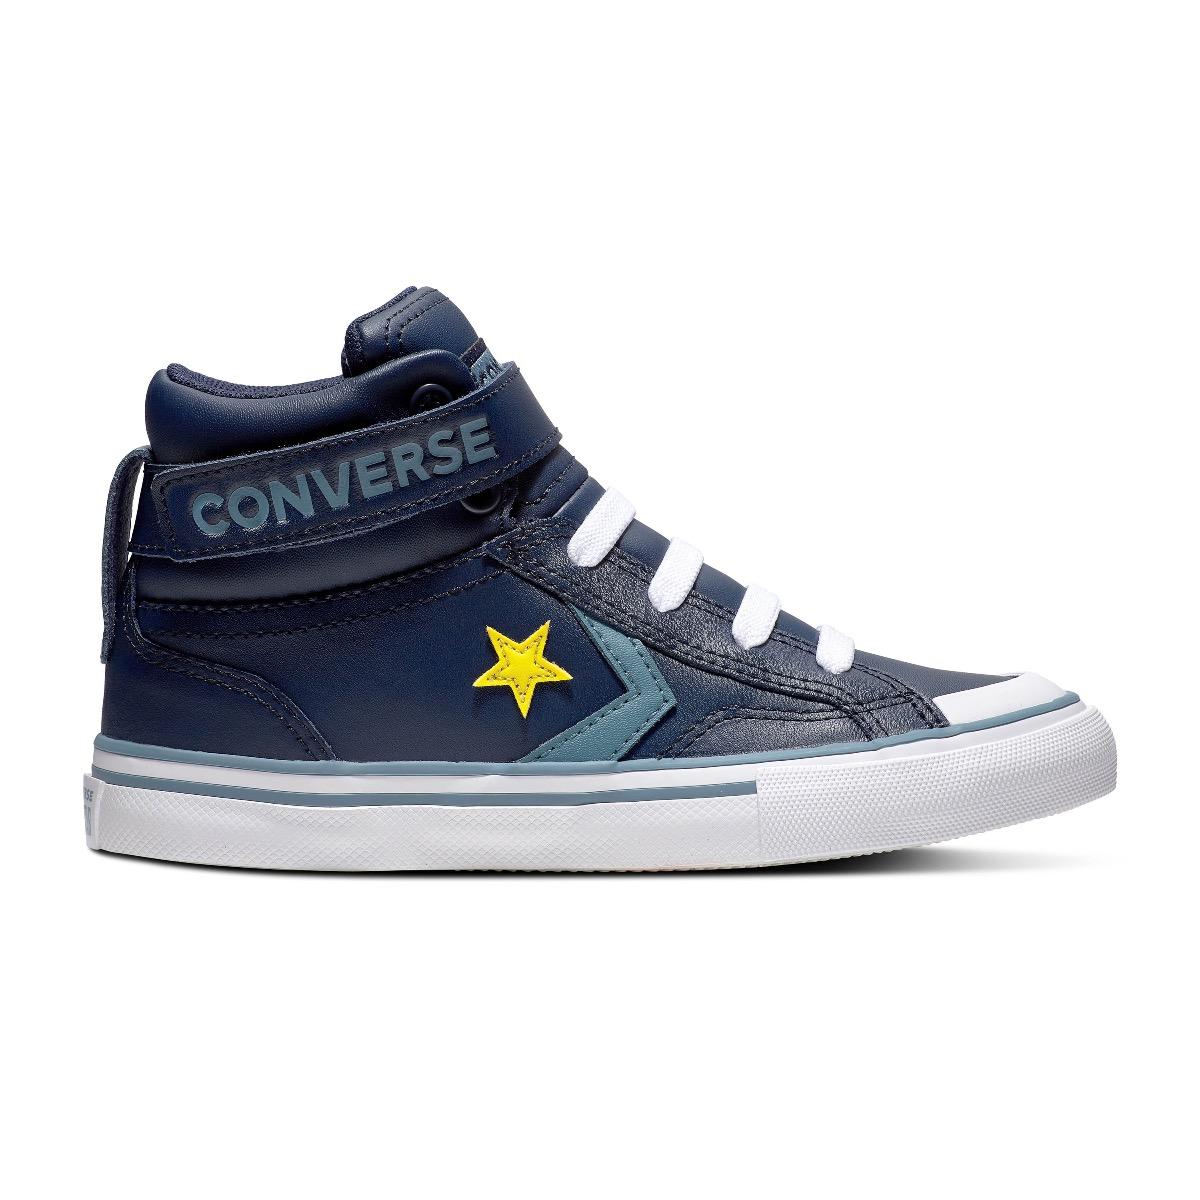 Converse All Stars Pro Blaze Strap 663607C Blauw-33.5